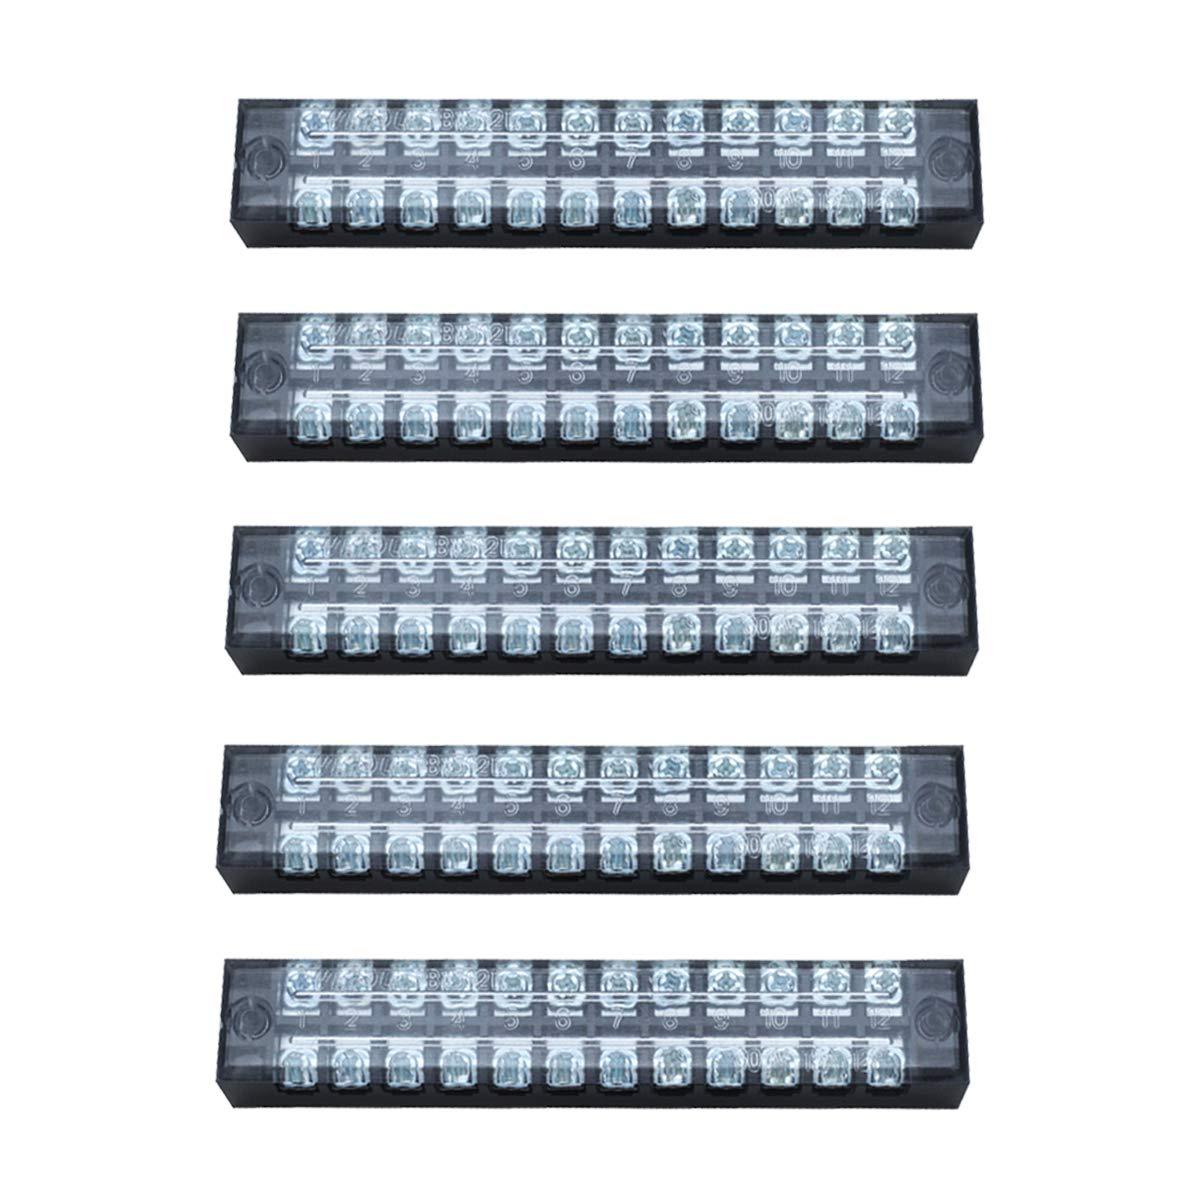 Dasunny 5Pcs Screw Terminal Strip 600V 15A Dual Row 12 Positions Electric Barrier Strip Block, TB-1512